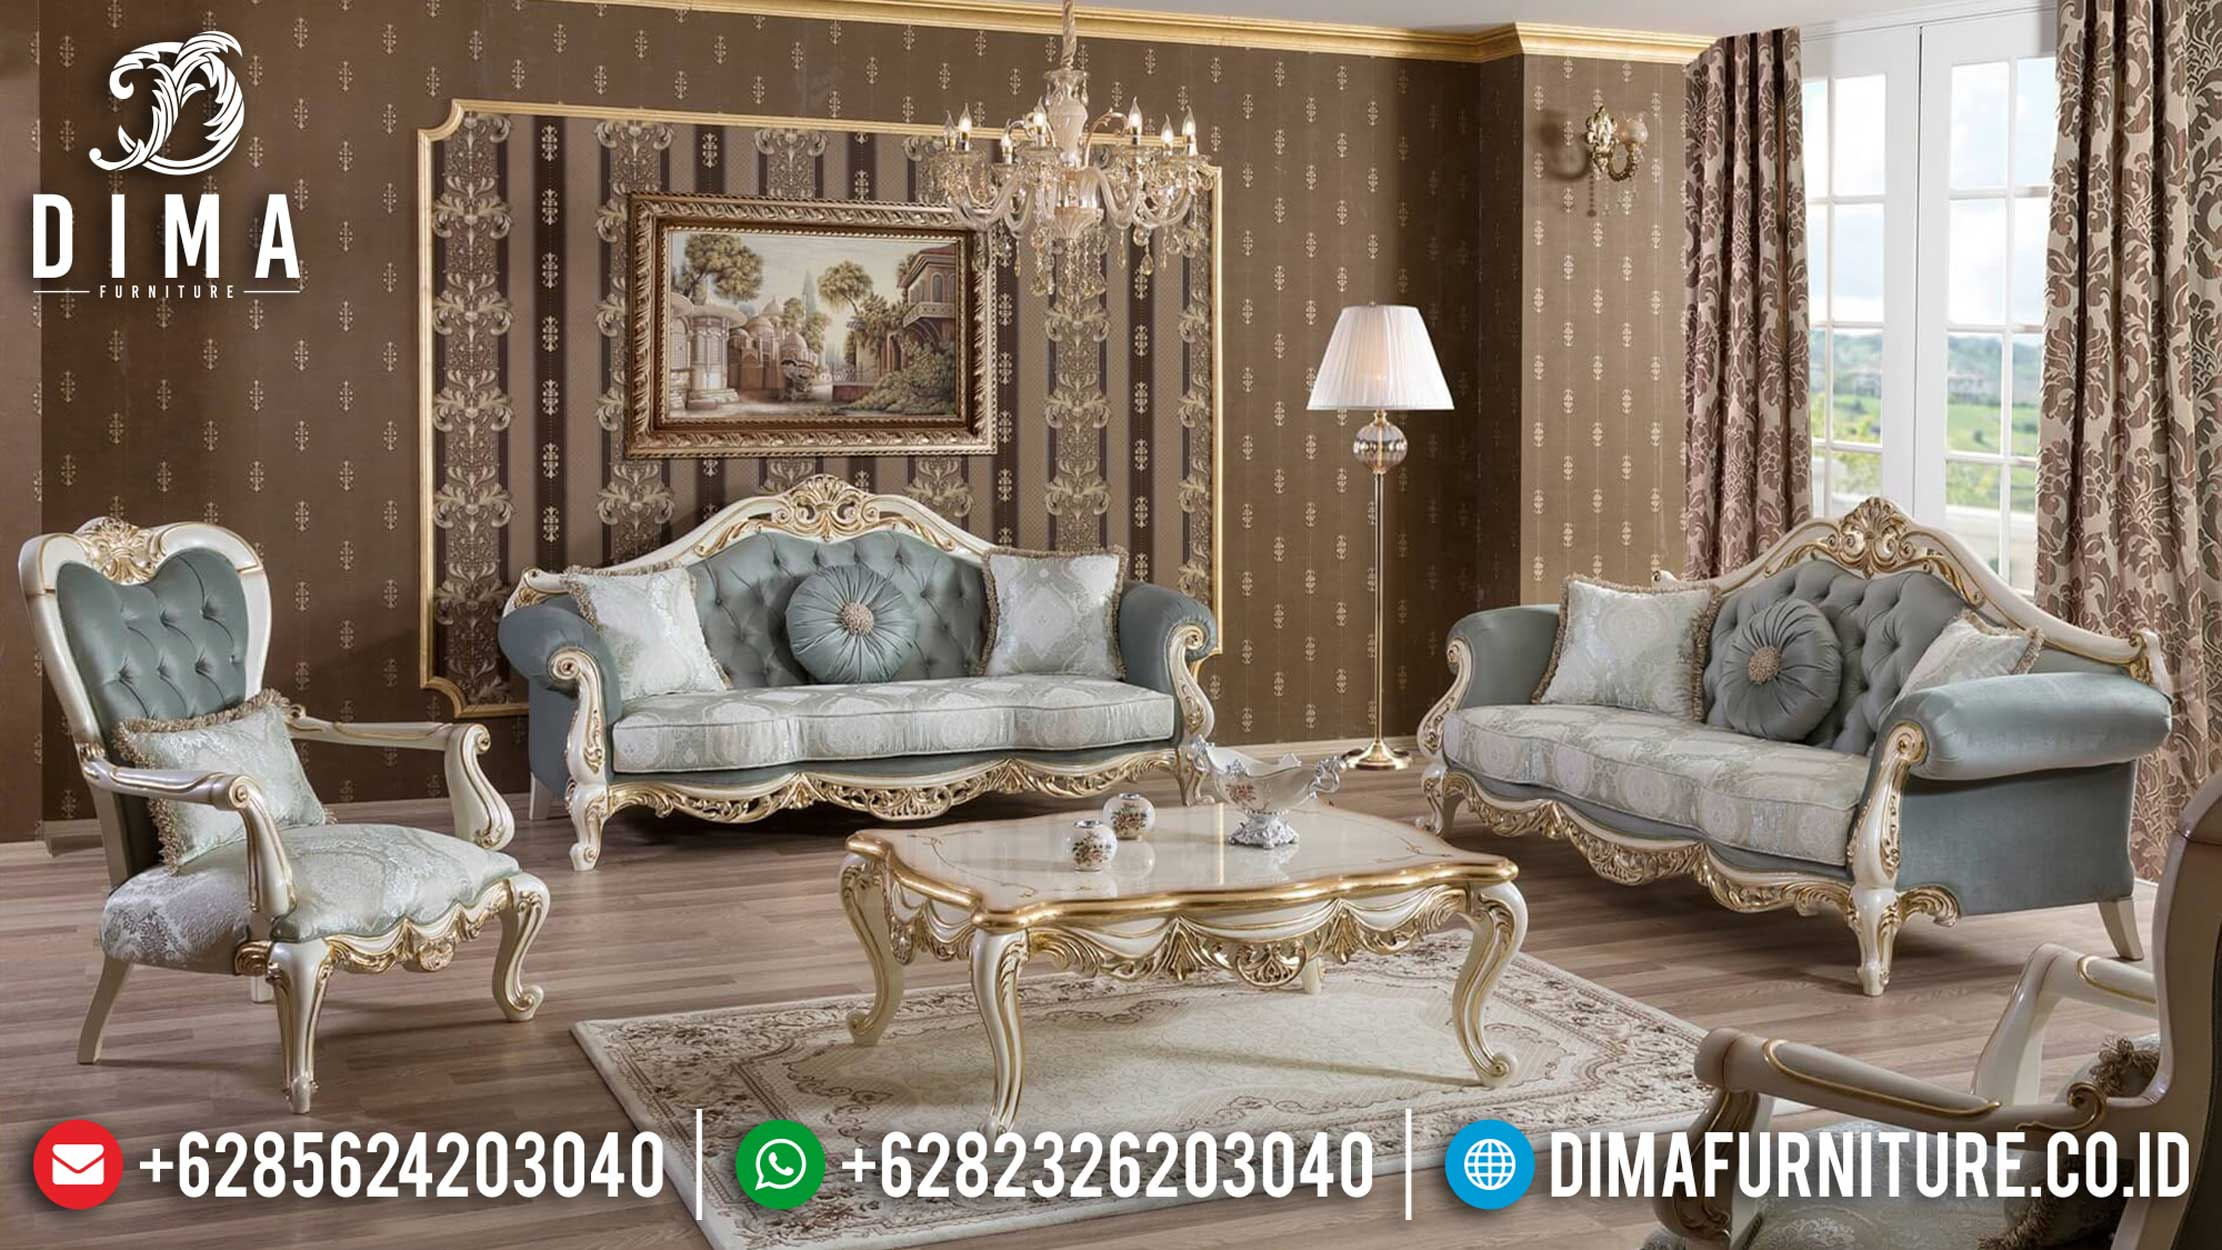 Sale On Weekend Sofa Tamu Mewah Jepara Harga Istimewa Beautiful Design MMJ-0944